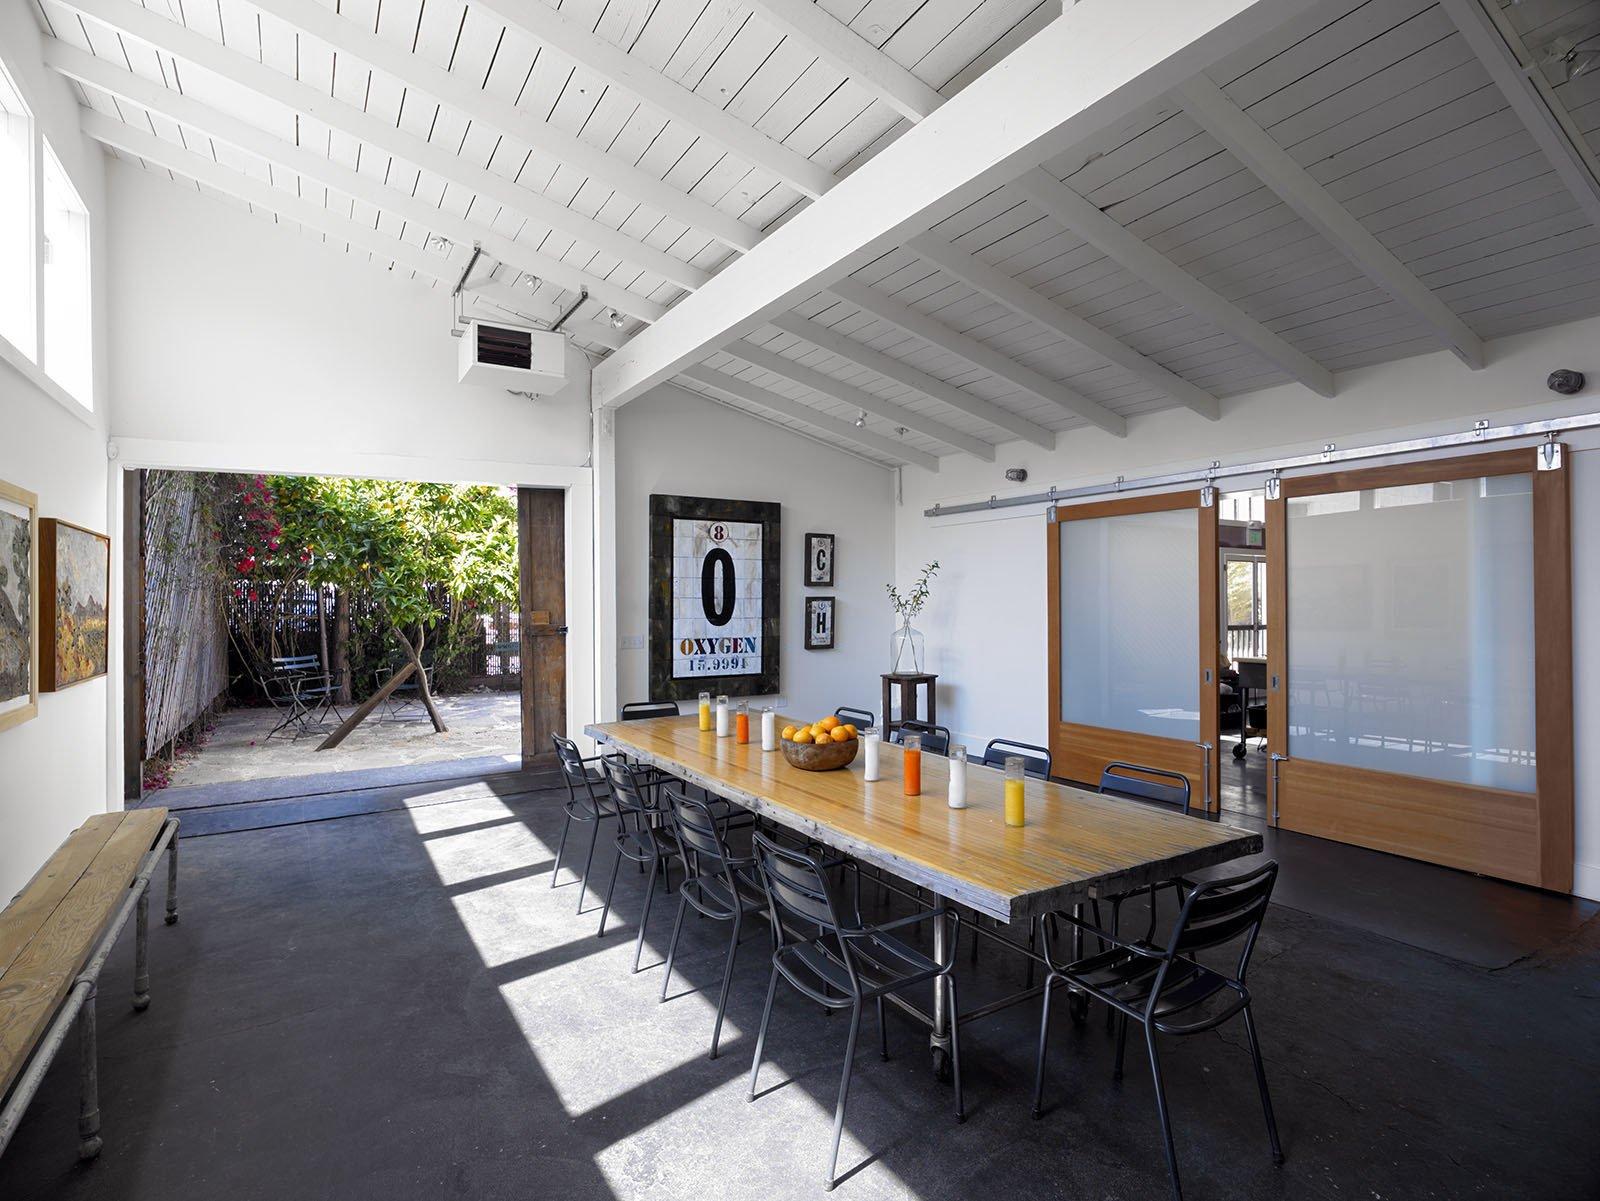 Stable Cafe  Architect: Malcolm Davis Architecture  Location: San Francisco, California  Photo 4 of 5 in Architecture + Food = Stable Cafe